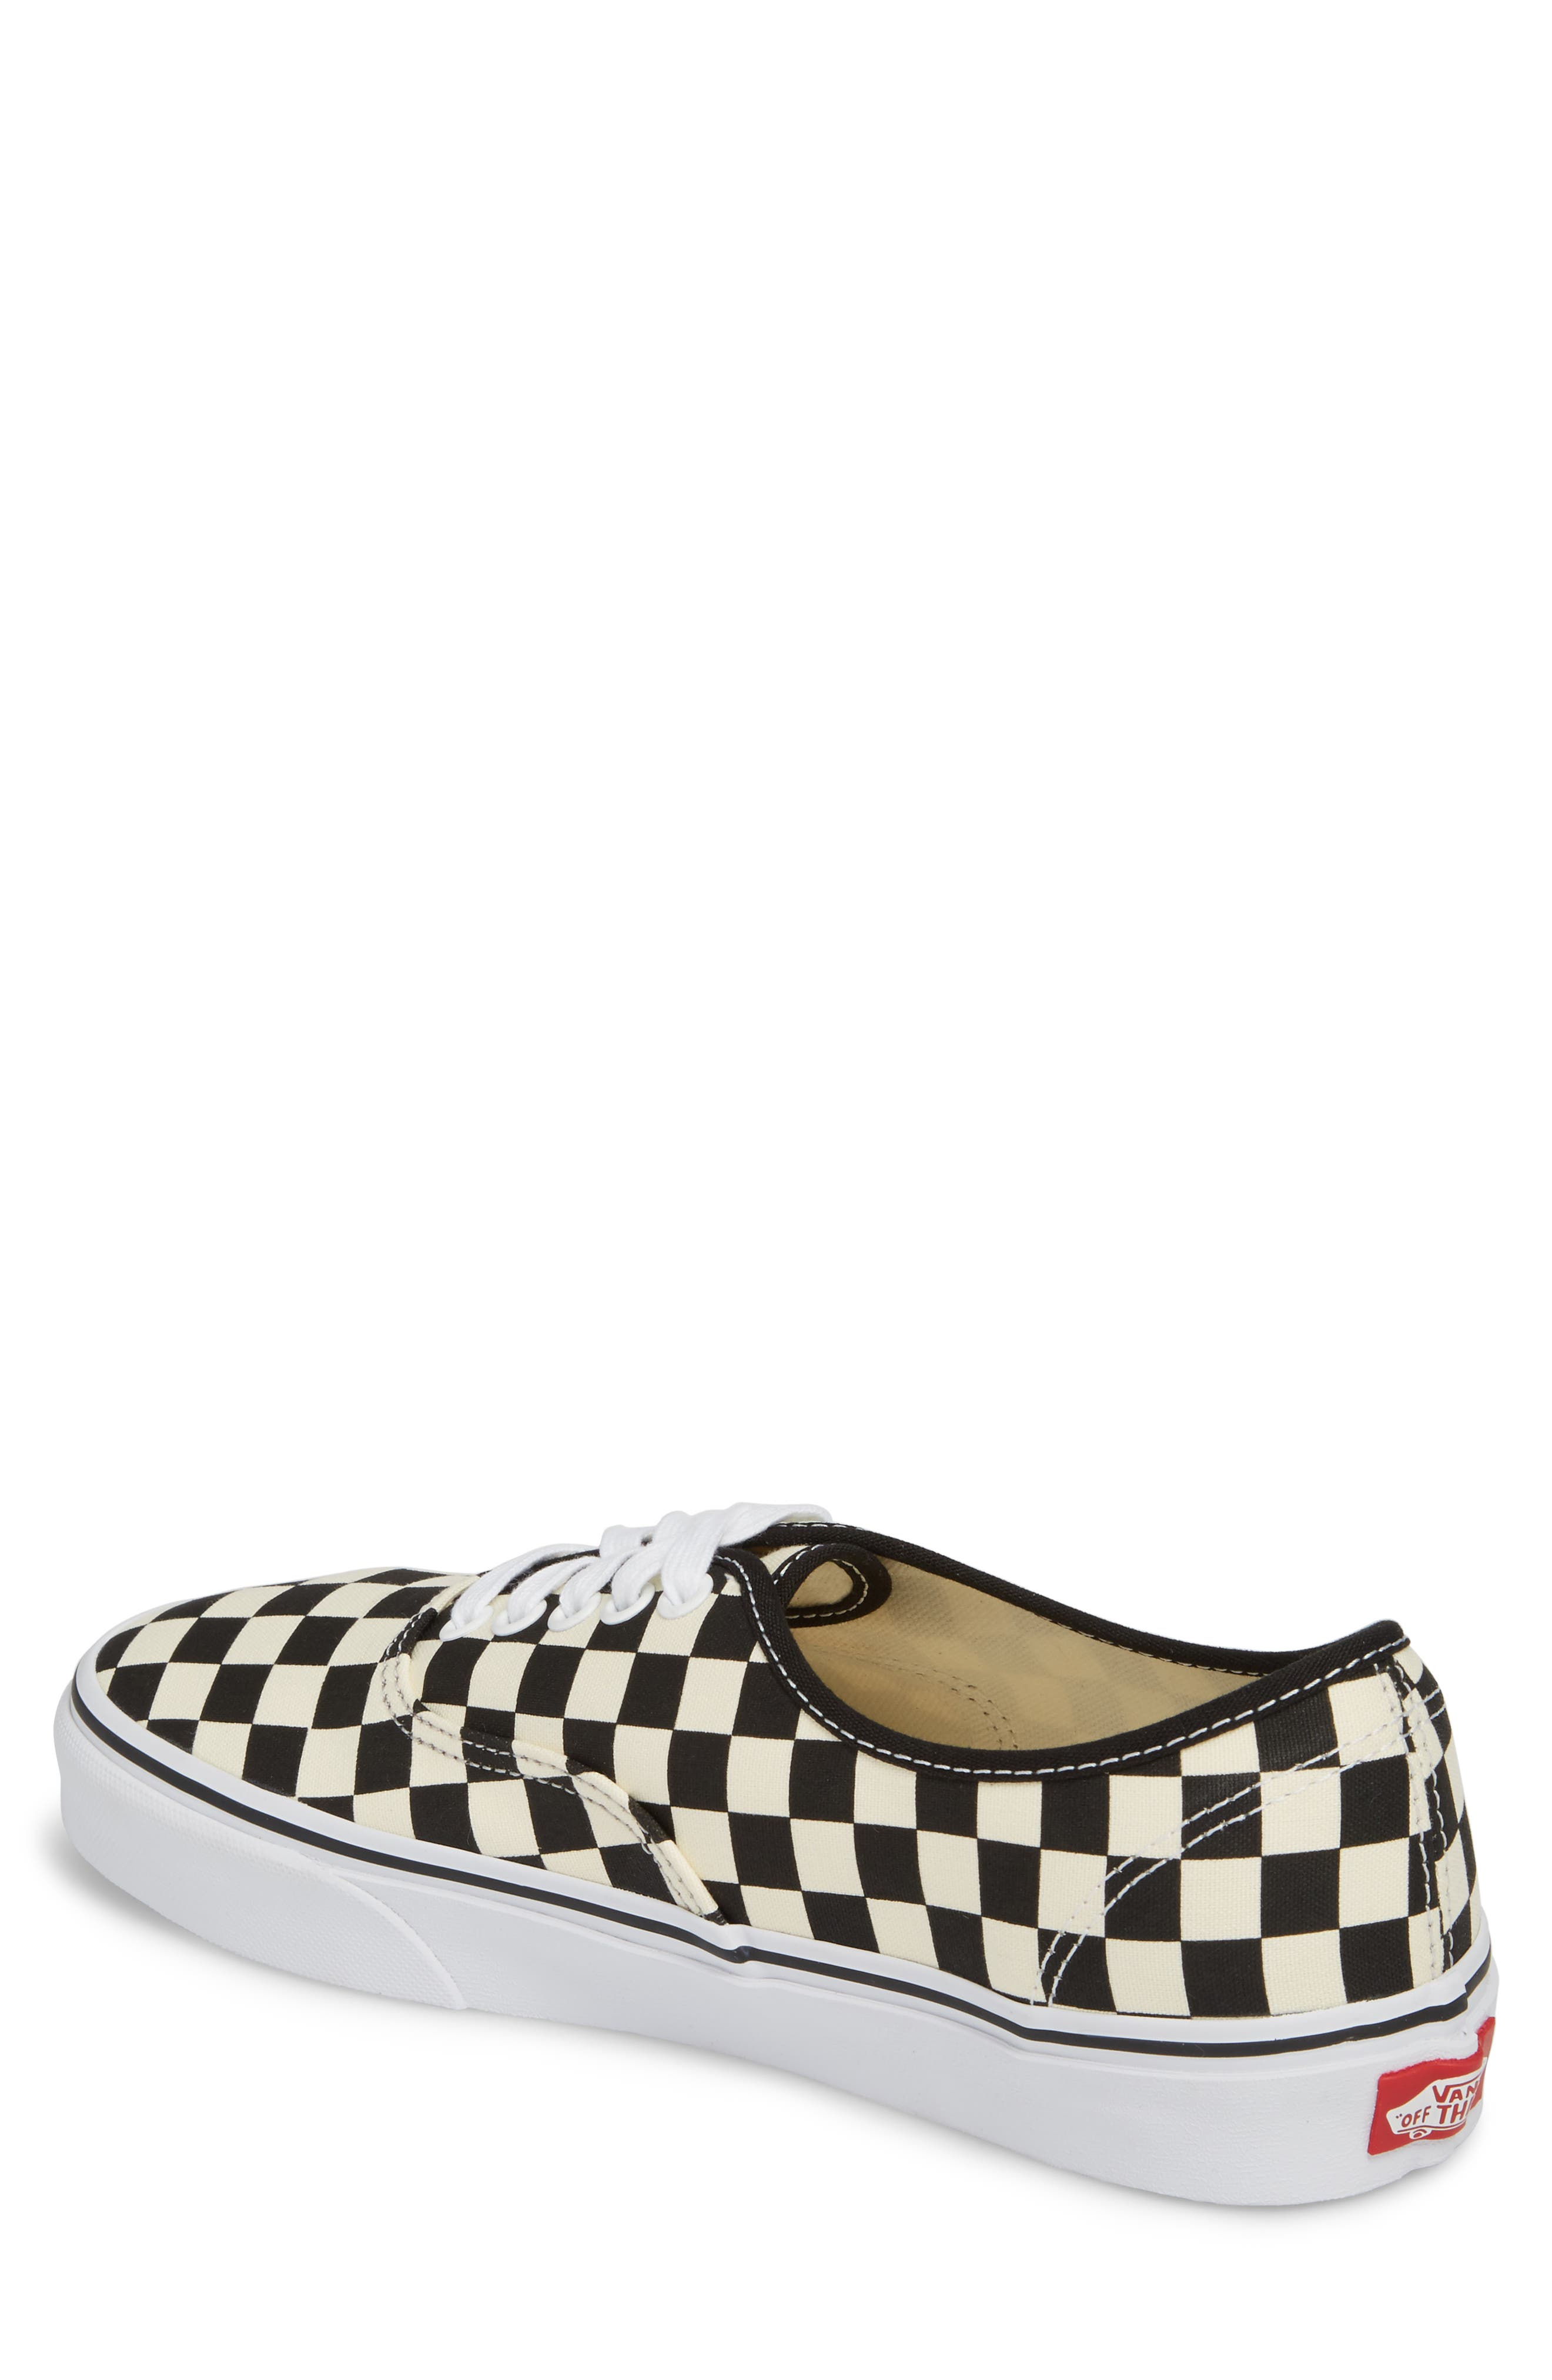 Authentic Golden Coast Sneaker,                             Alternate thumbnail 2, color,                             BLACK/ WHITE CHECKER